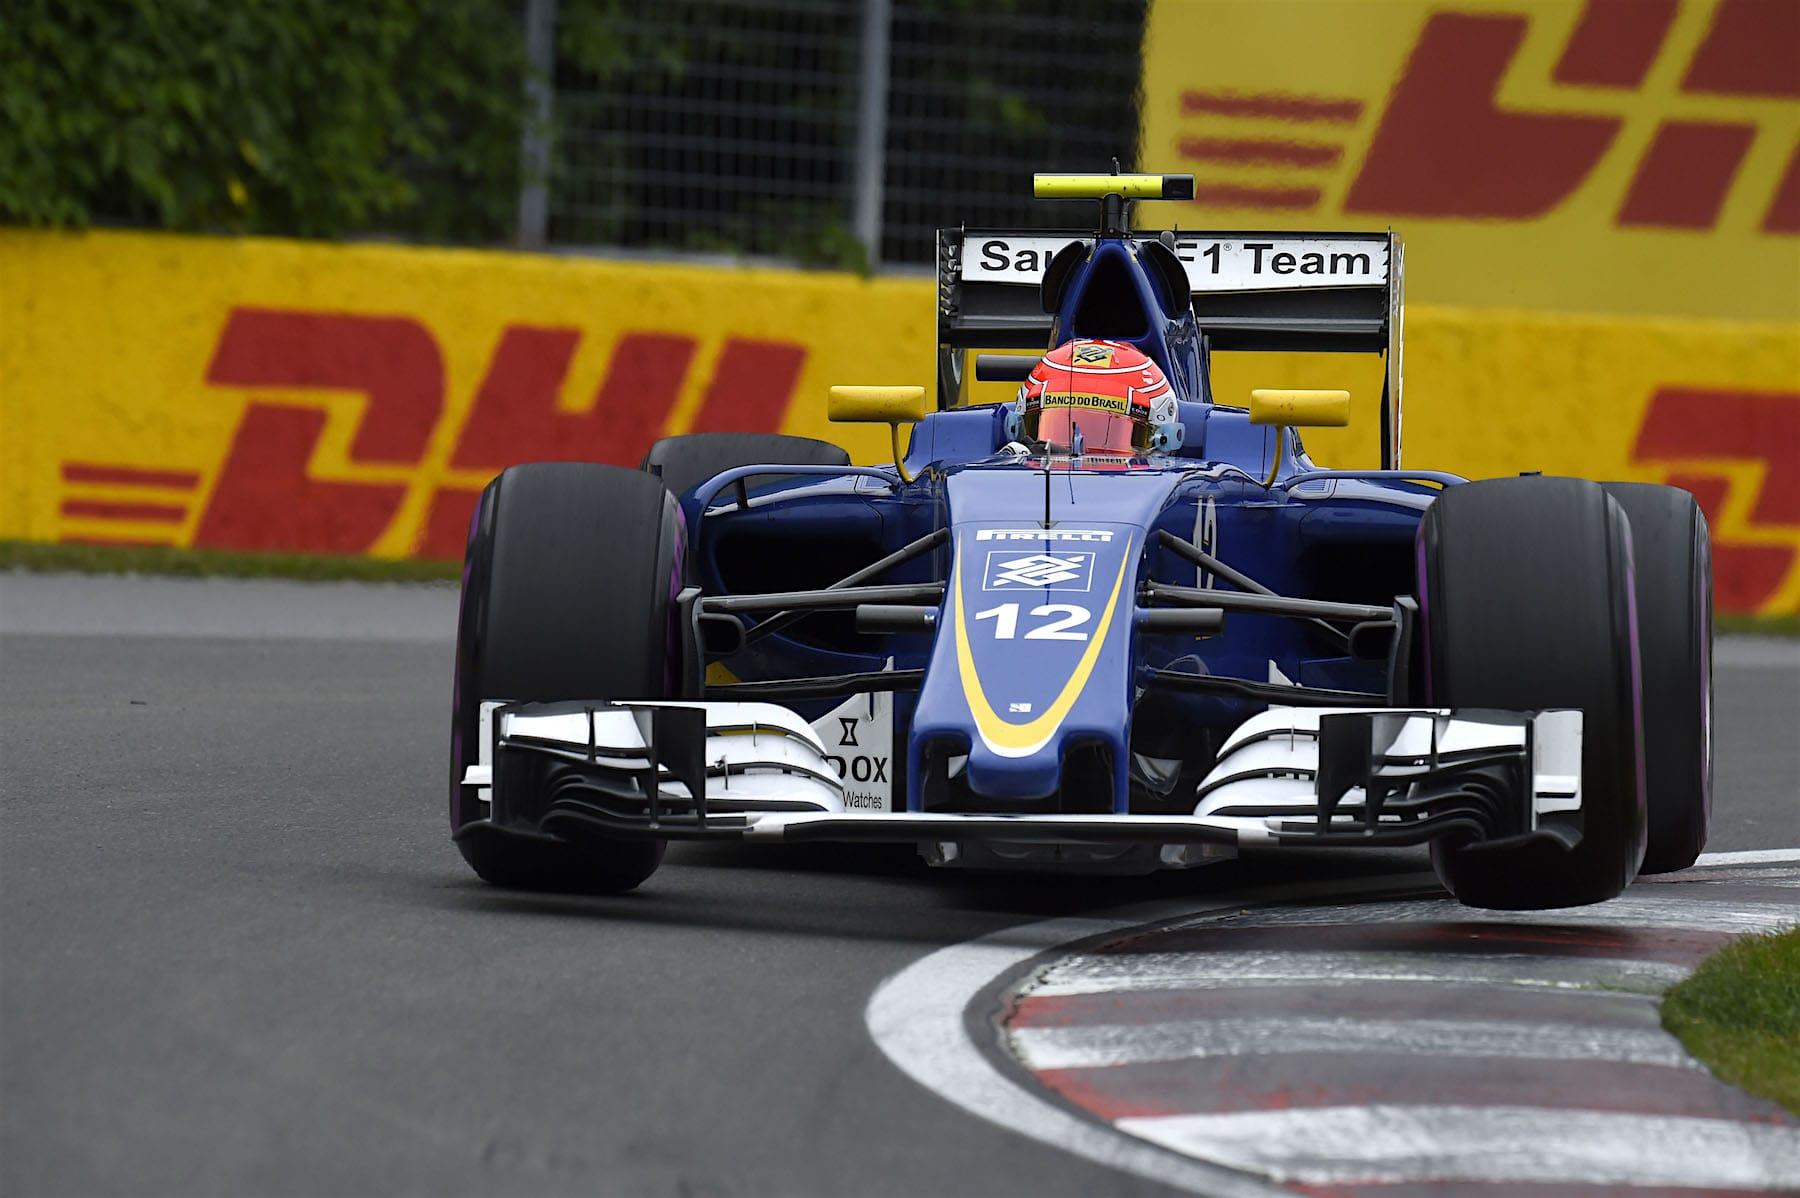 Salracing - Felipe Nasr | Sauber F1 Team